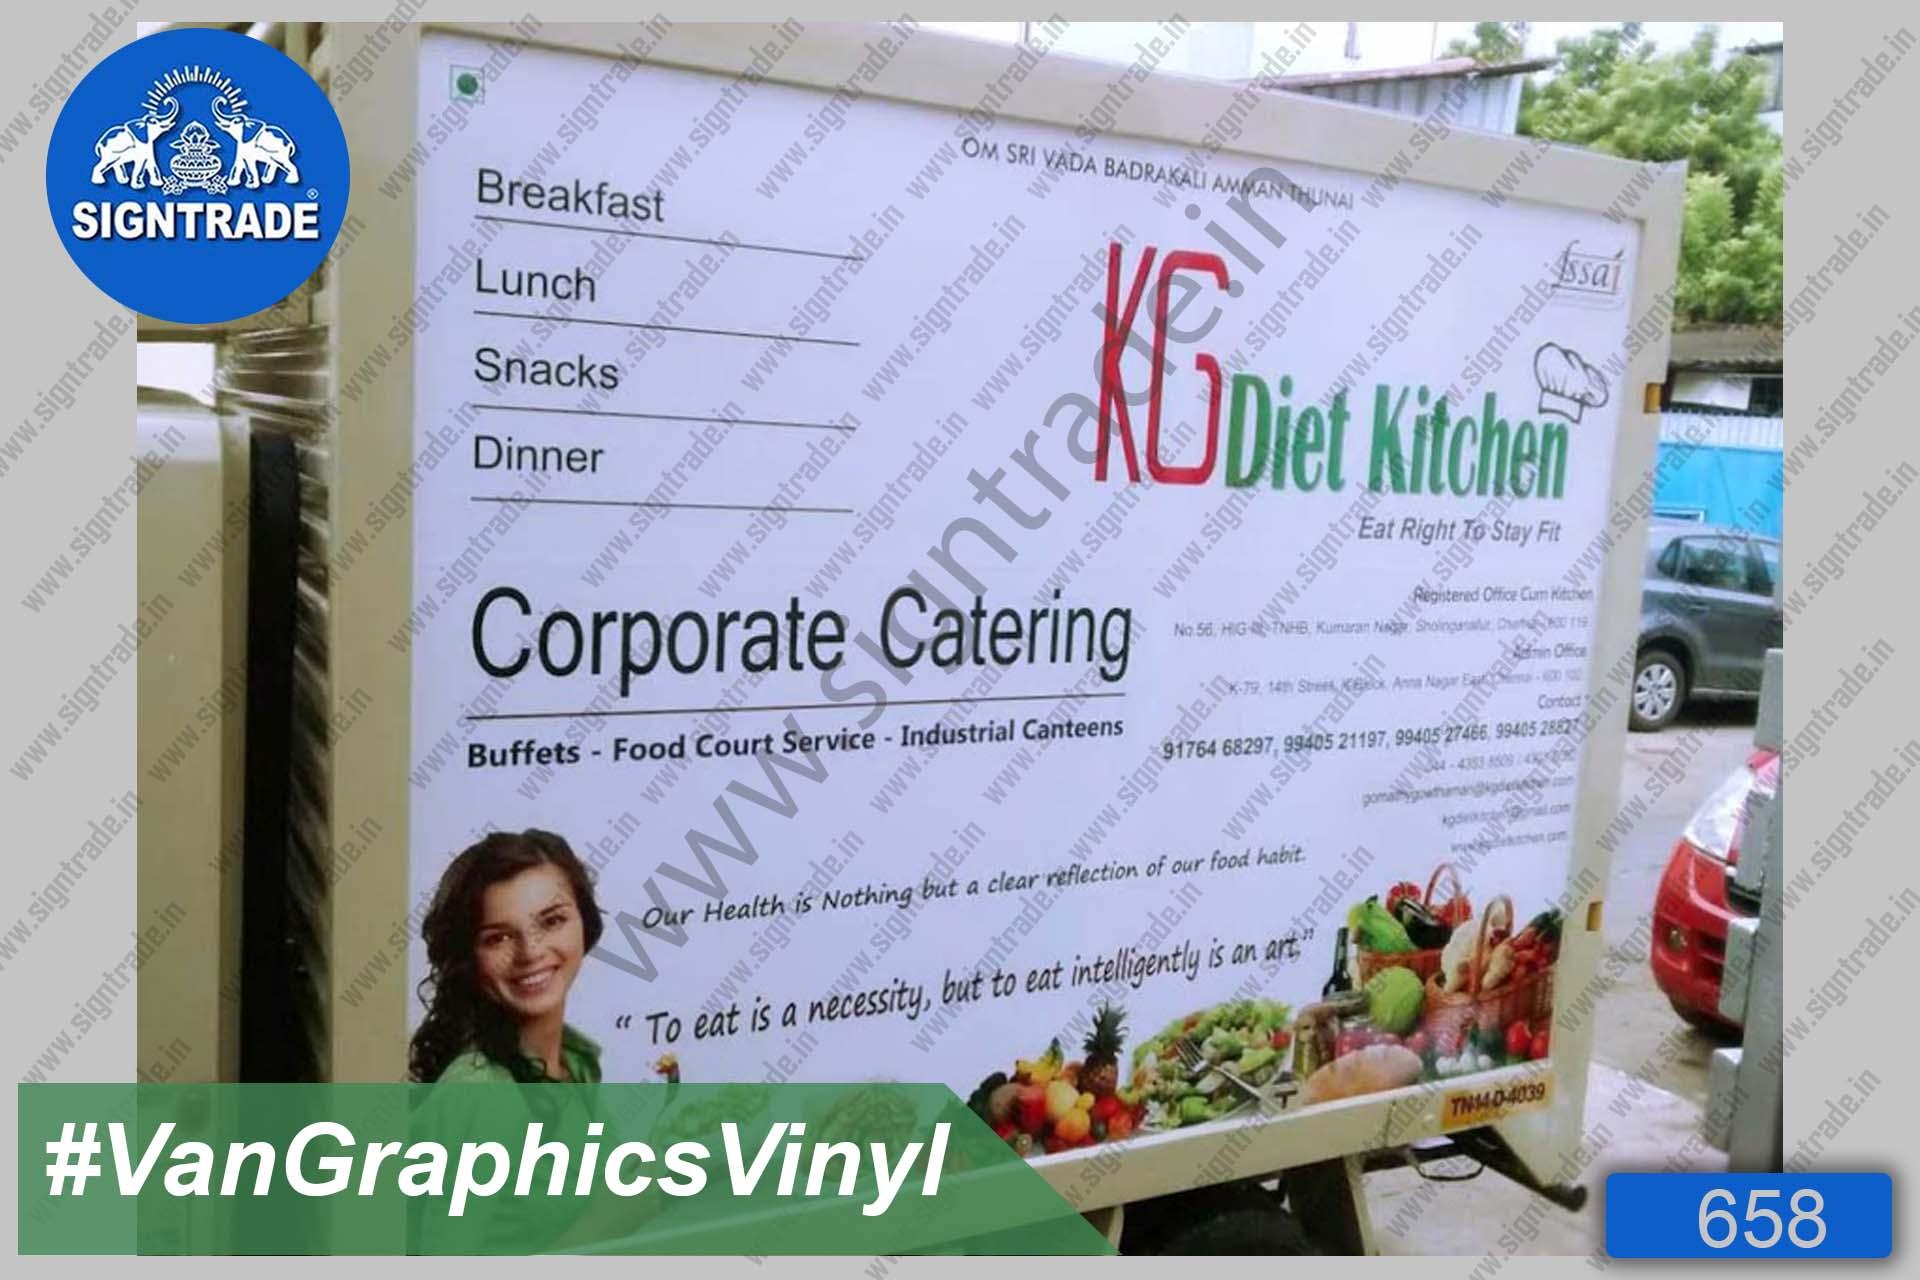 KG Diet Kitchen - Corporate Catering - Chennai